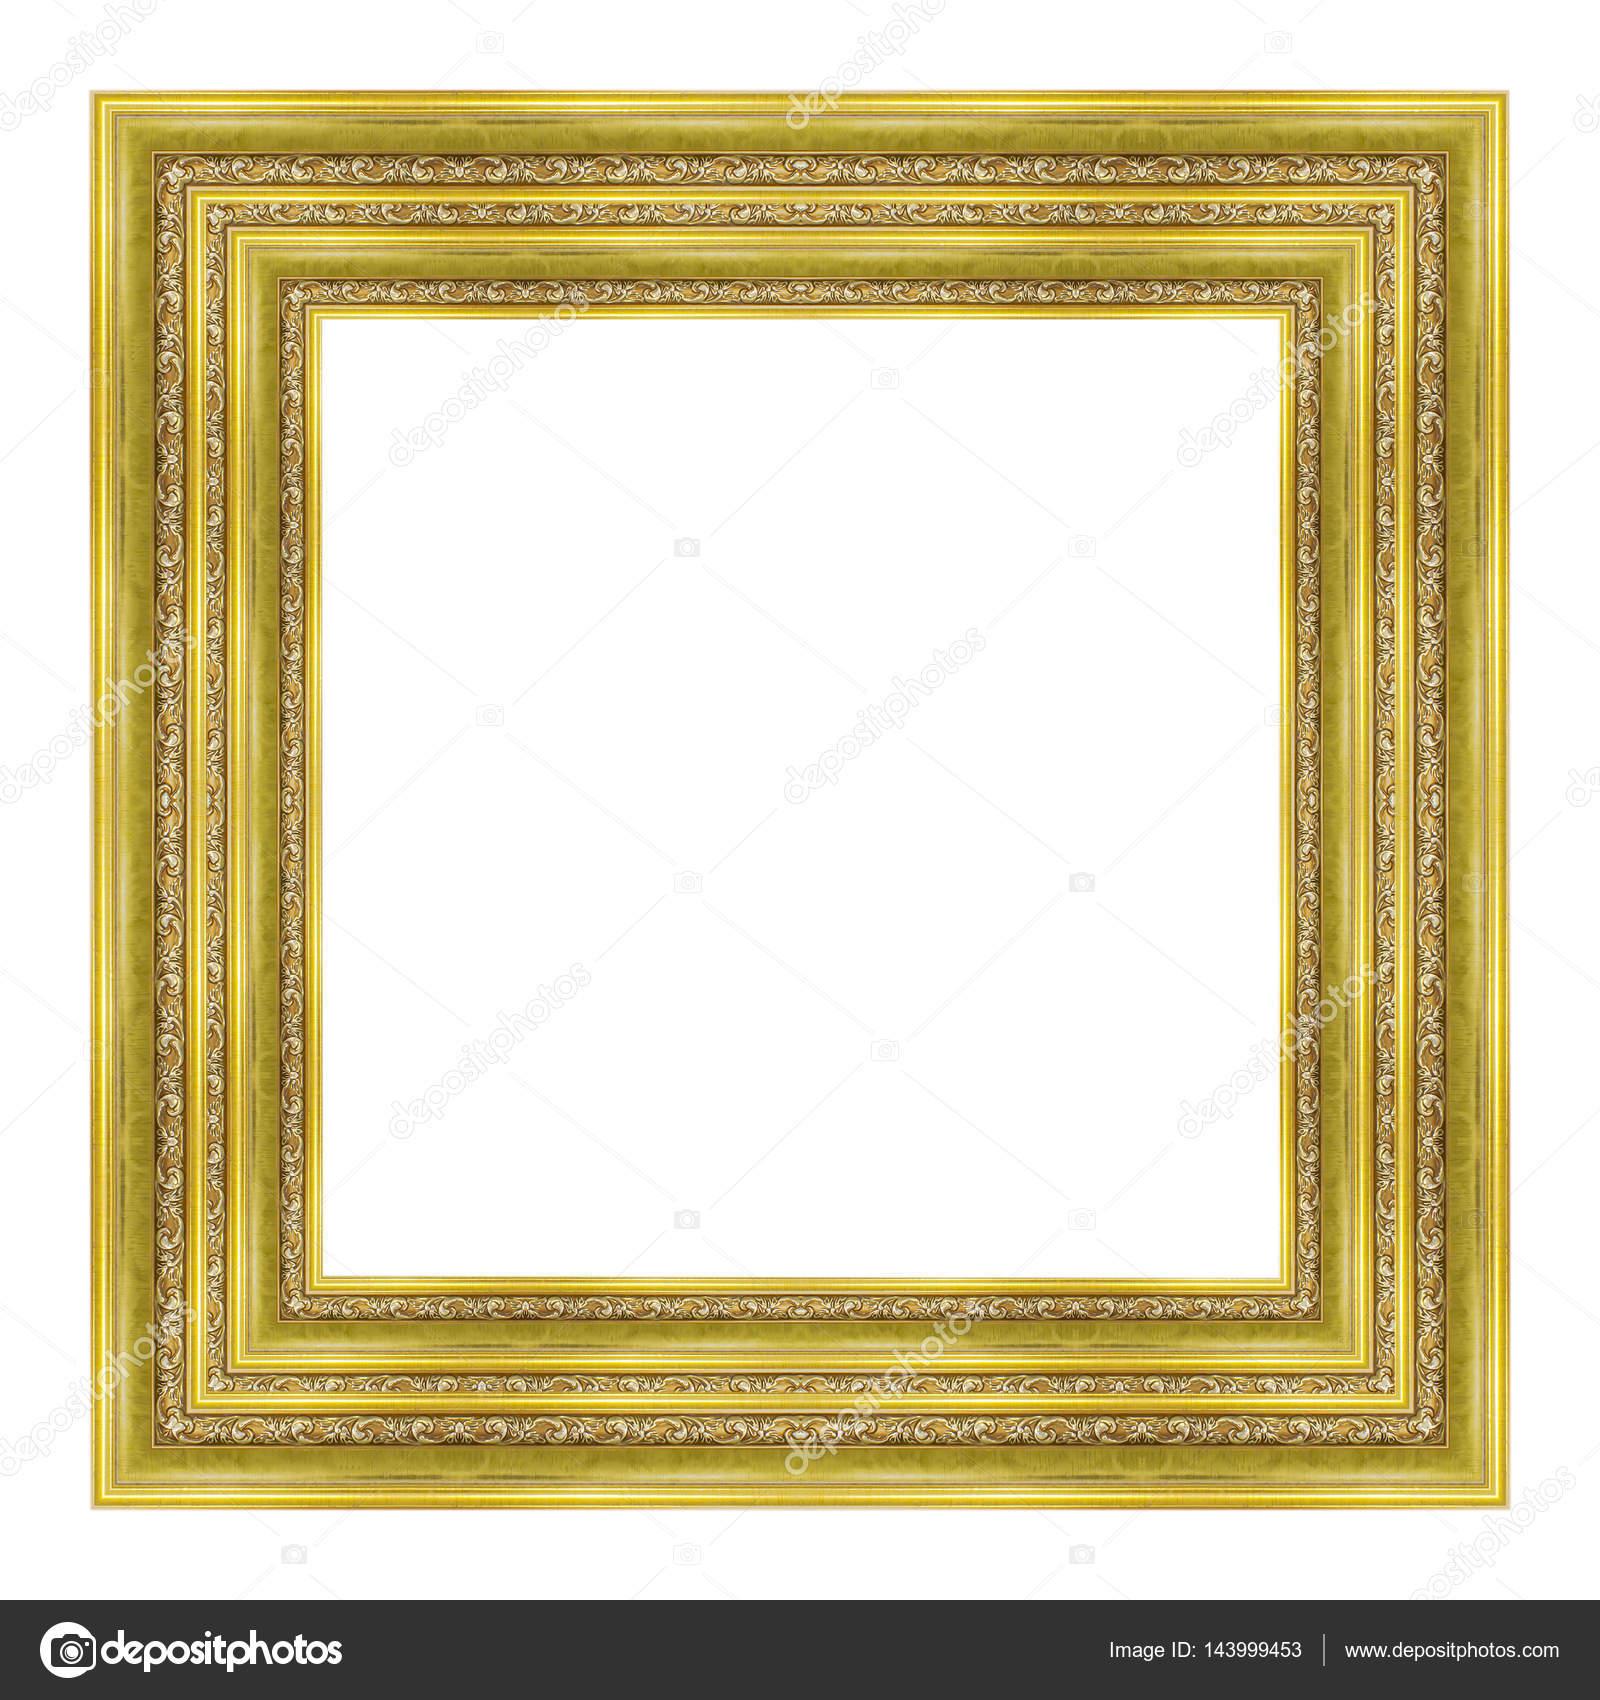 patrón de marco de madera tallada de marco de cuadro aislado sobre ...